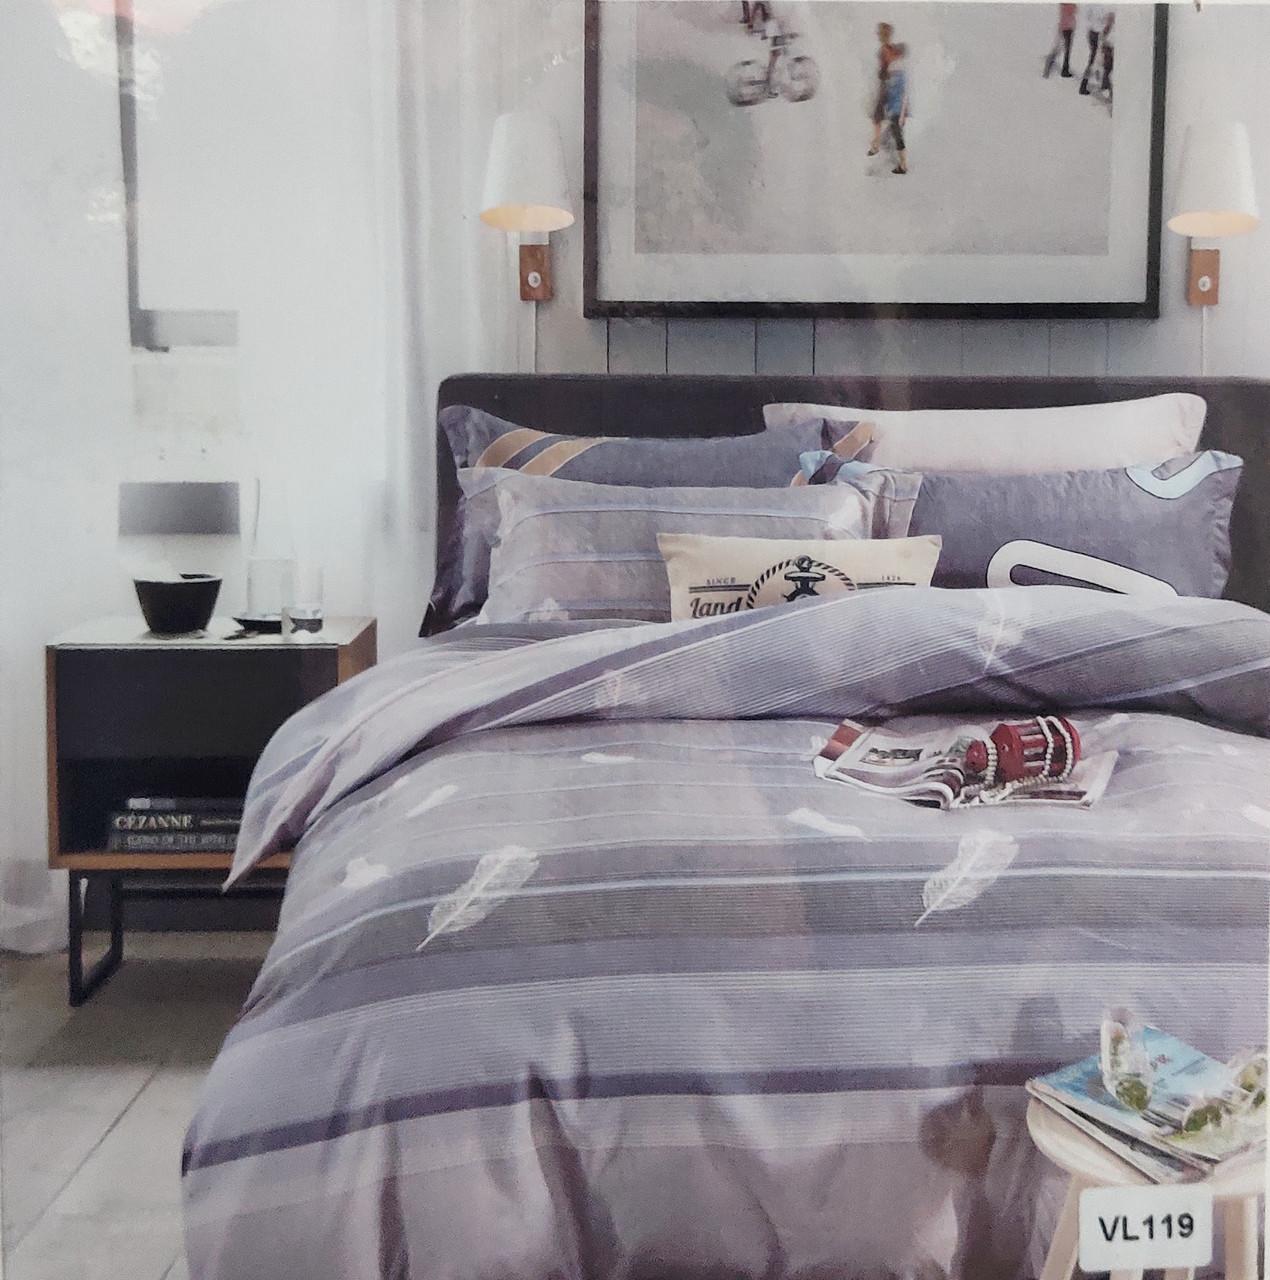 Комплект постельного белья микровелюр Vie Nouvelle Velour 200х220  VL119 евро